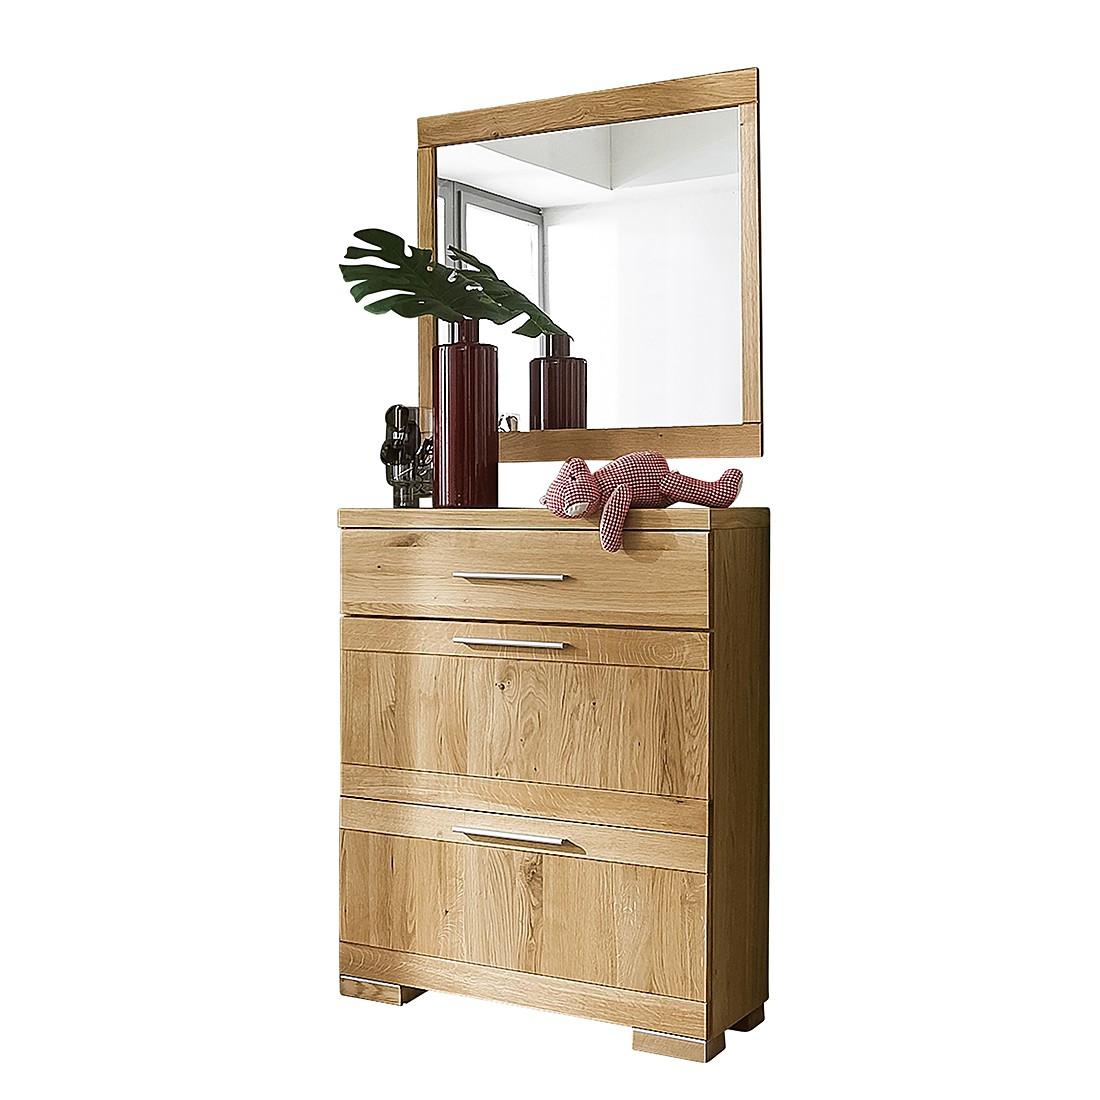 spiegel online kaufen. Black Bedroom Furniture Sets. Home Design Ideas